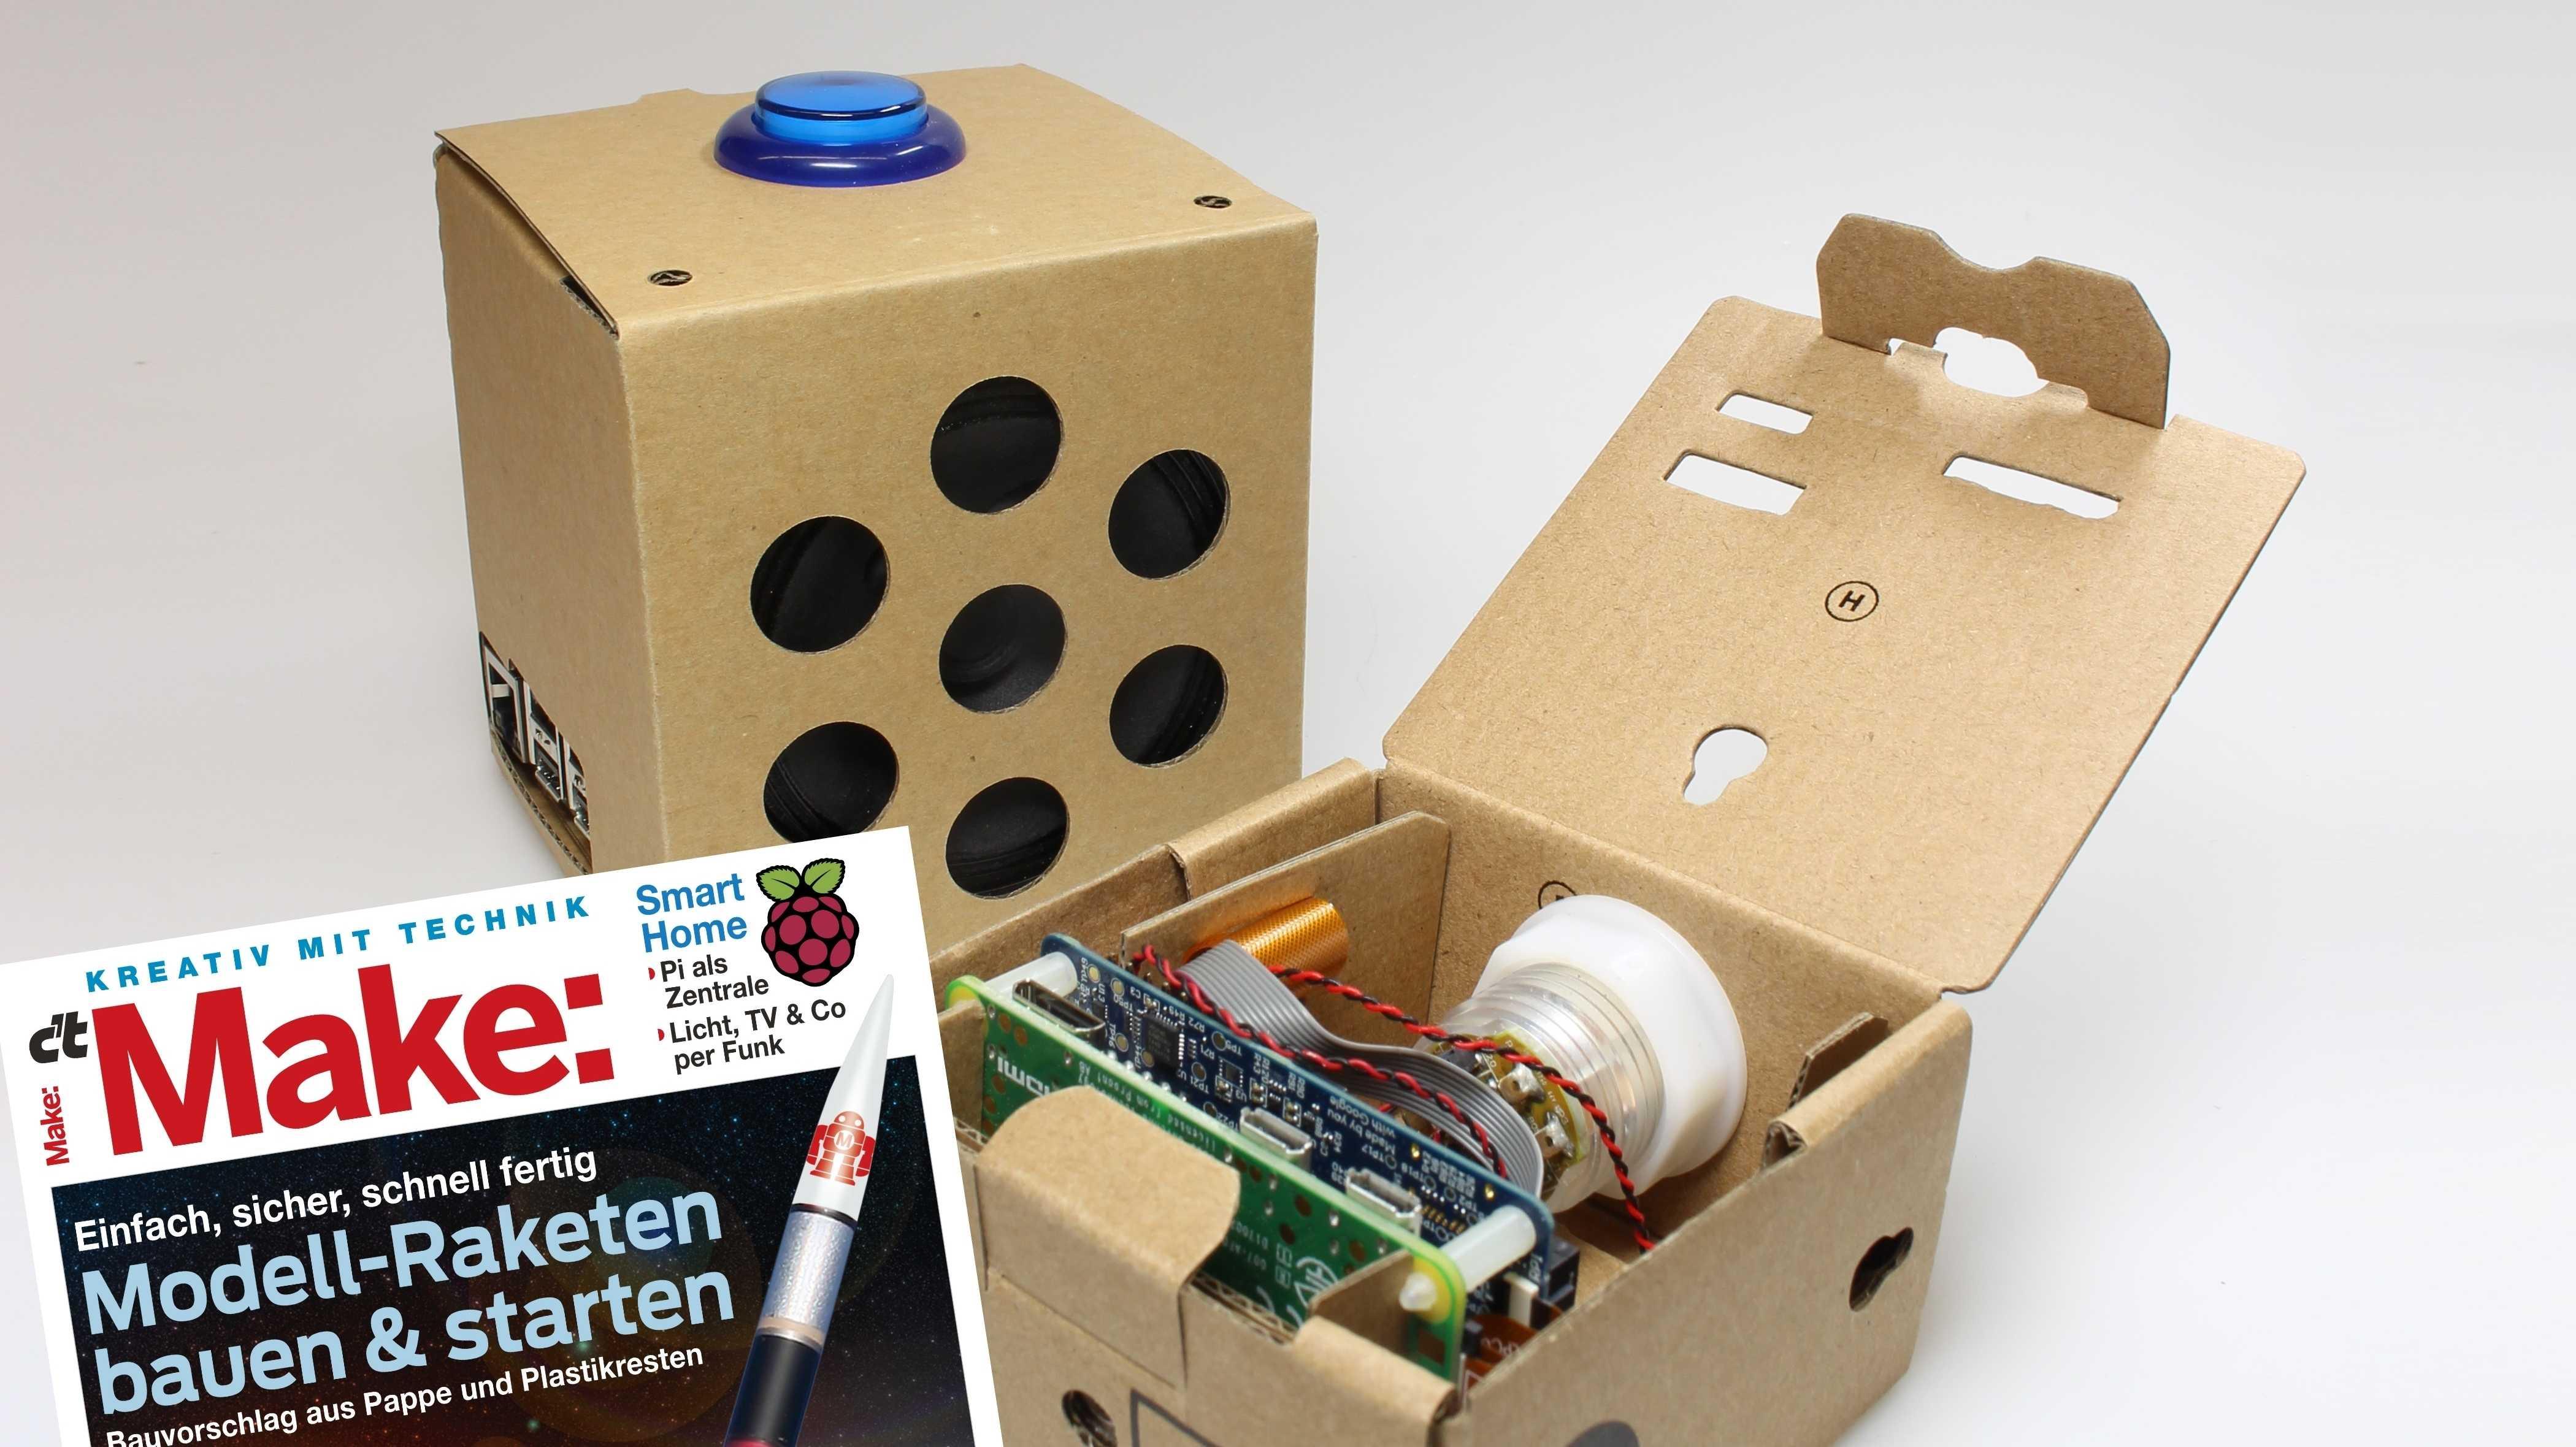 Make Magazin vor Google AIY Vision Kit und Raspberry Pi